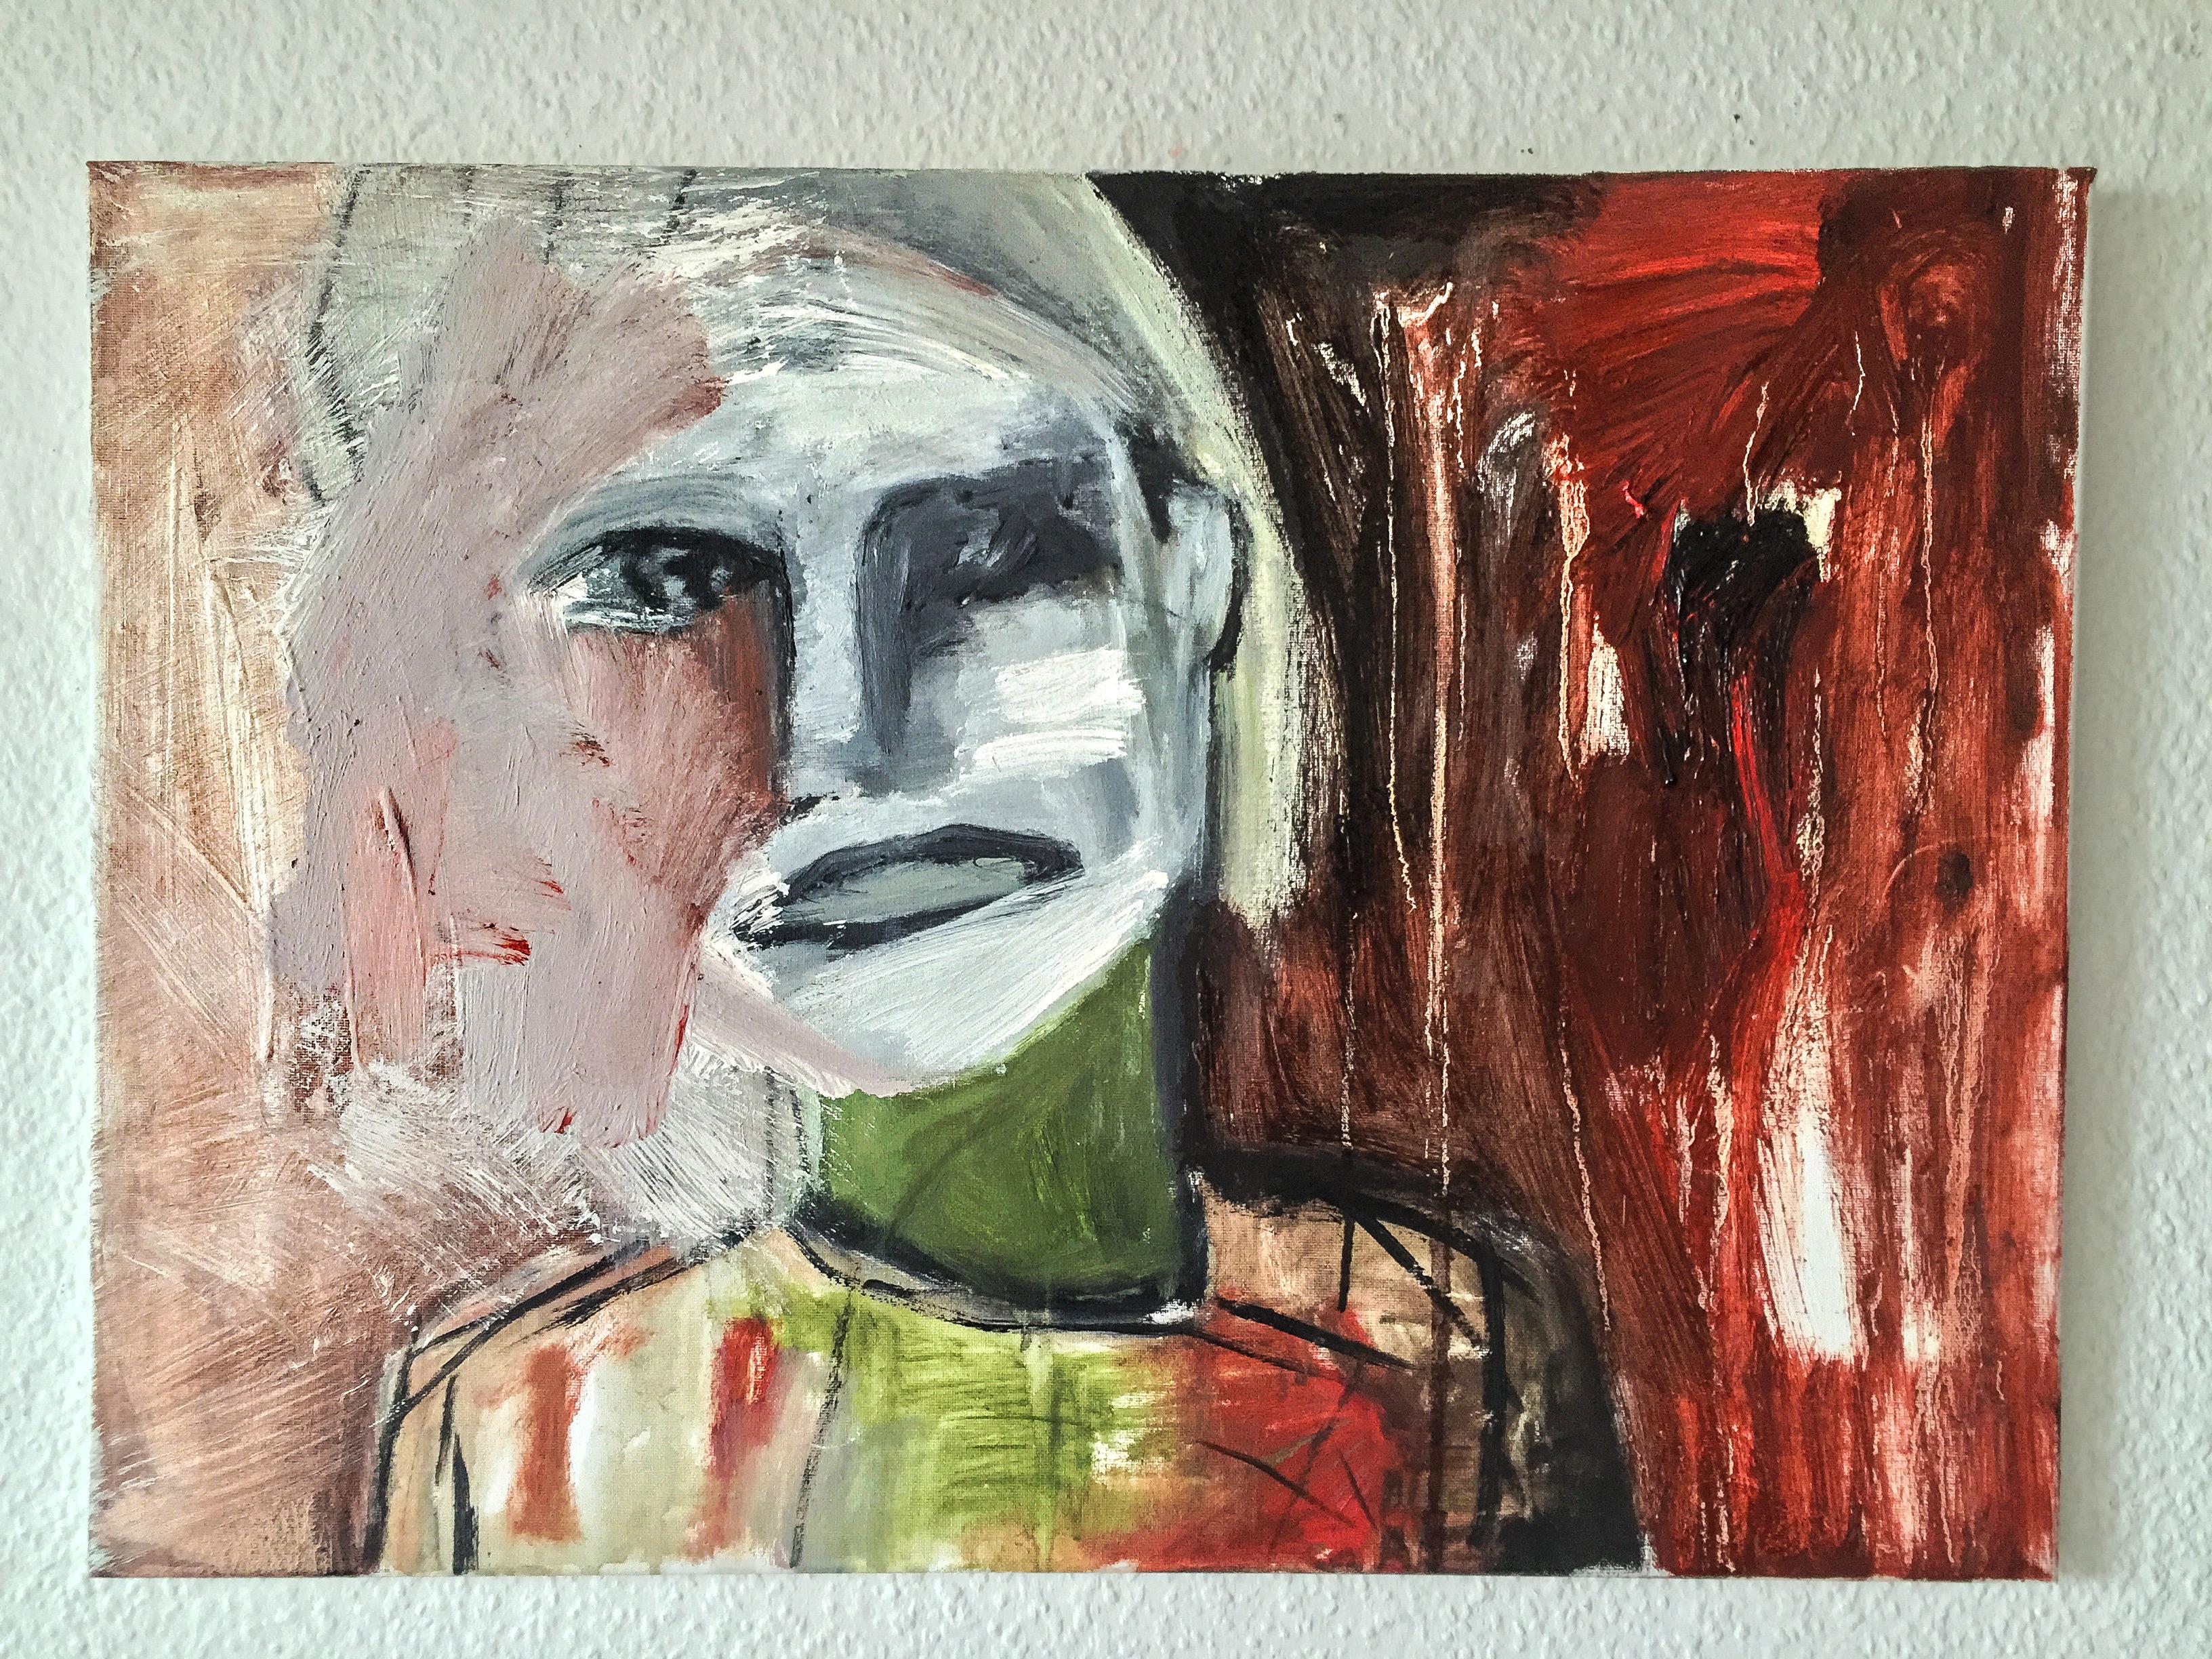 "Abstrakte Malerei ""Faces: Gone from irrelity"" Künstlerin Kvila Bristenia, 50x70, Öl auf Leinwand, 12.2017 , abstrakte Bildergalerie, expressive Malerei, abstrakte malerei, abstrakte bilder, Gemälde und Malerei, direkt aus dem Kunst Atelier"